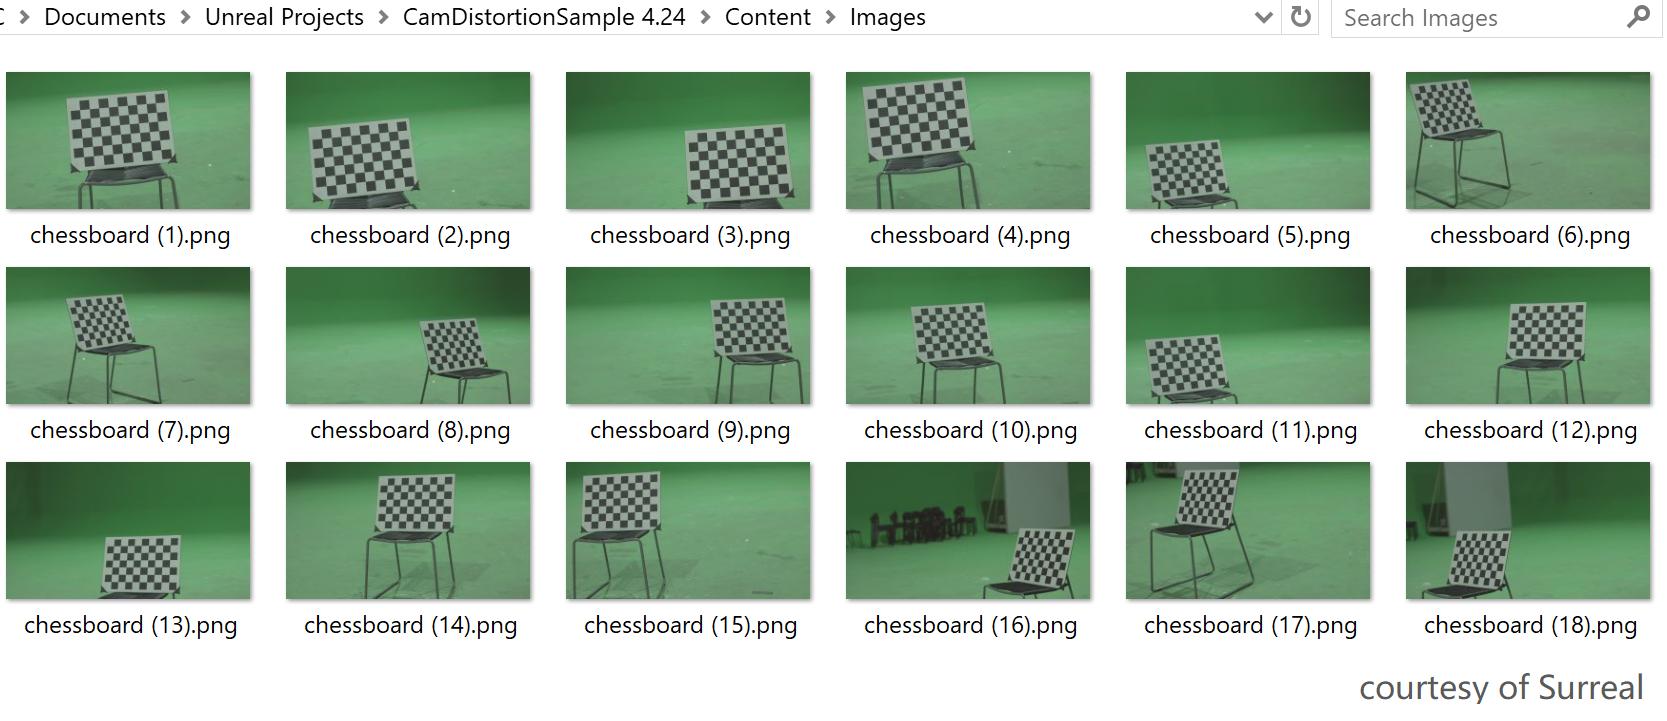 CheckboardSnapshots.png